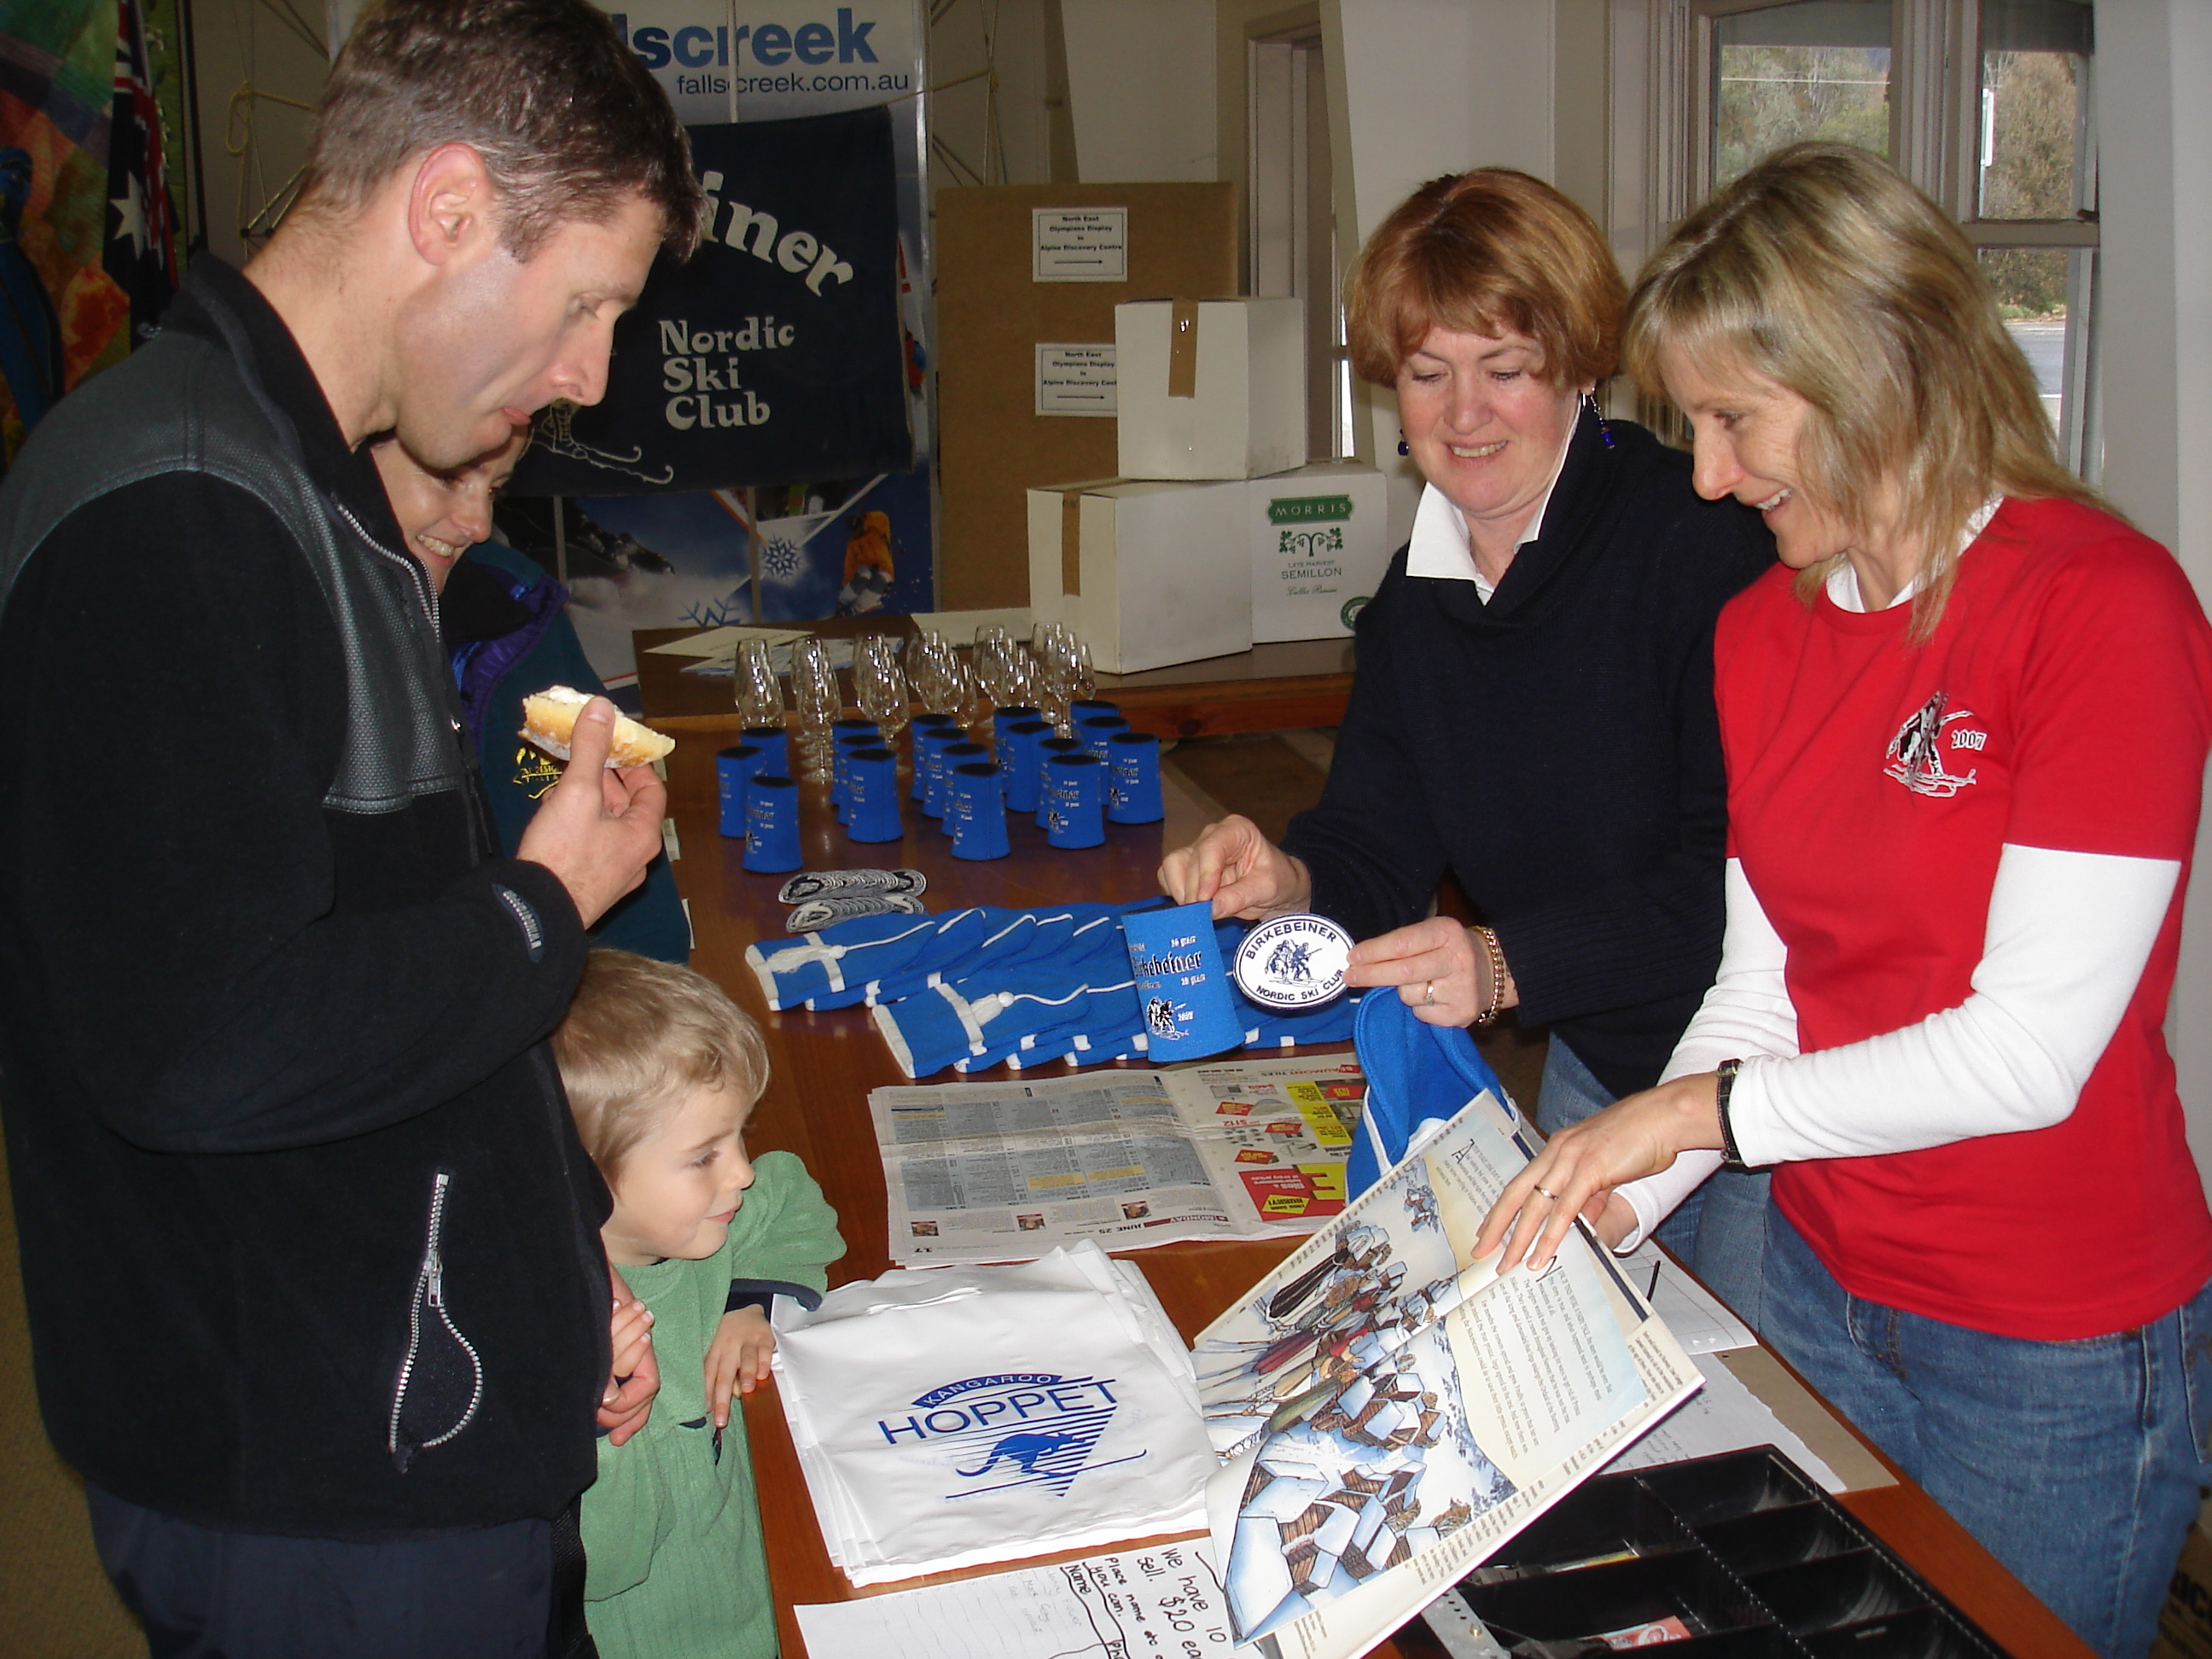 Mark Gray, Sue Hertozg & Jenny Flower